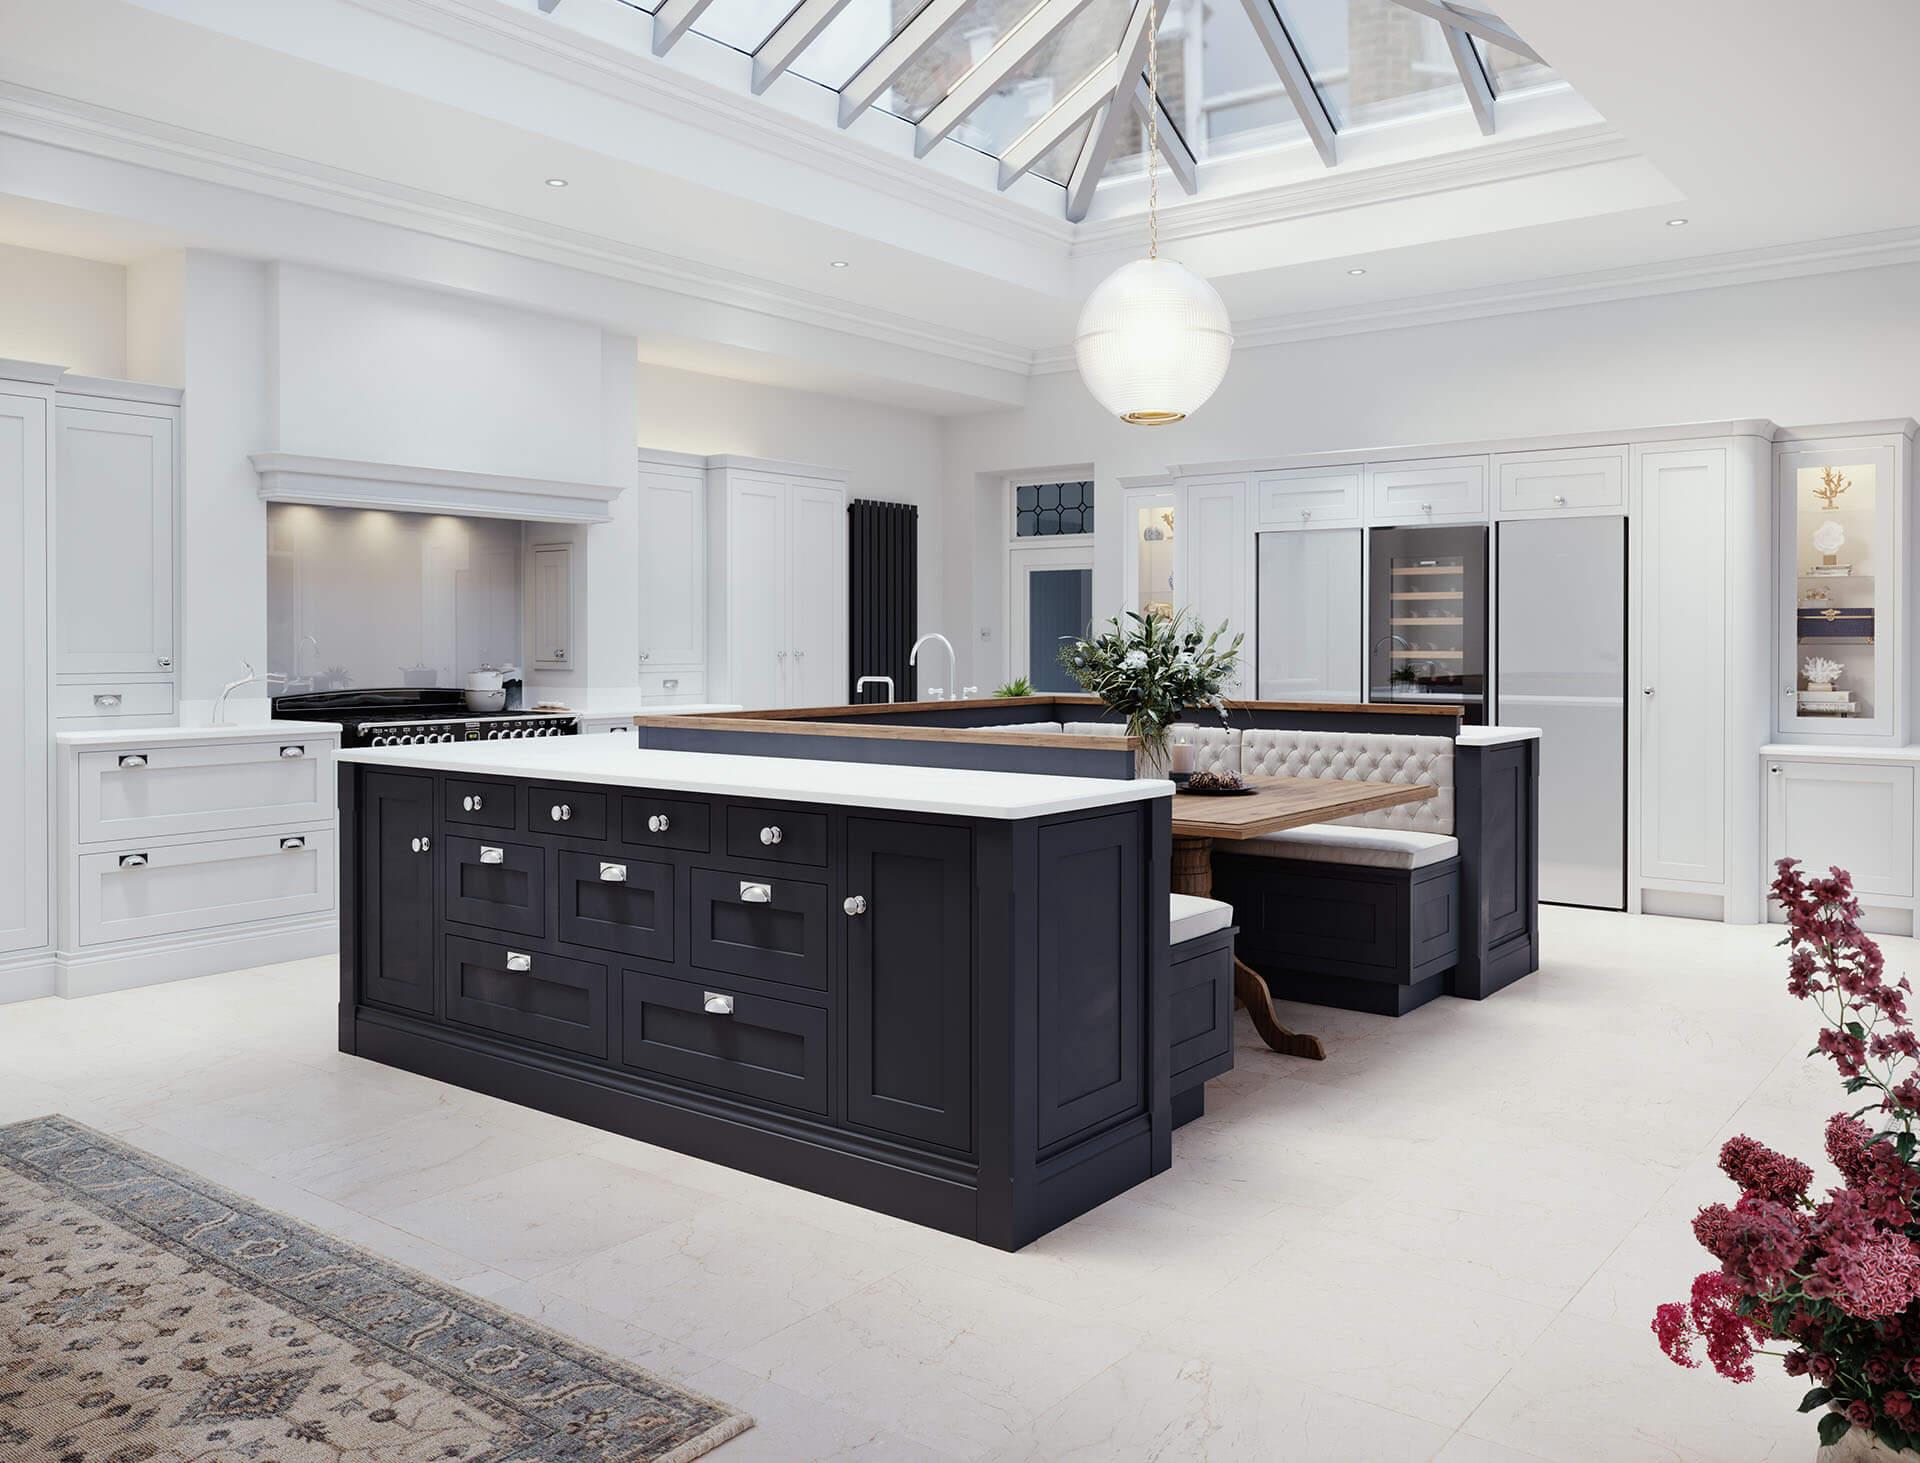 Napier Kitchen Collection